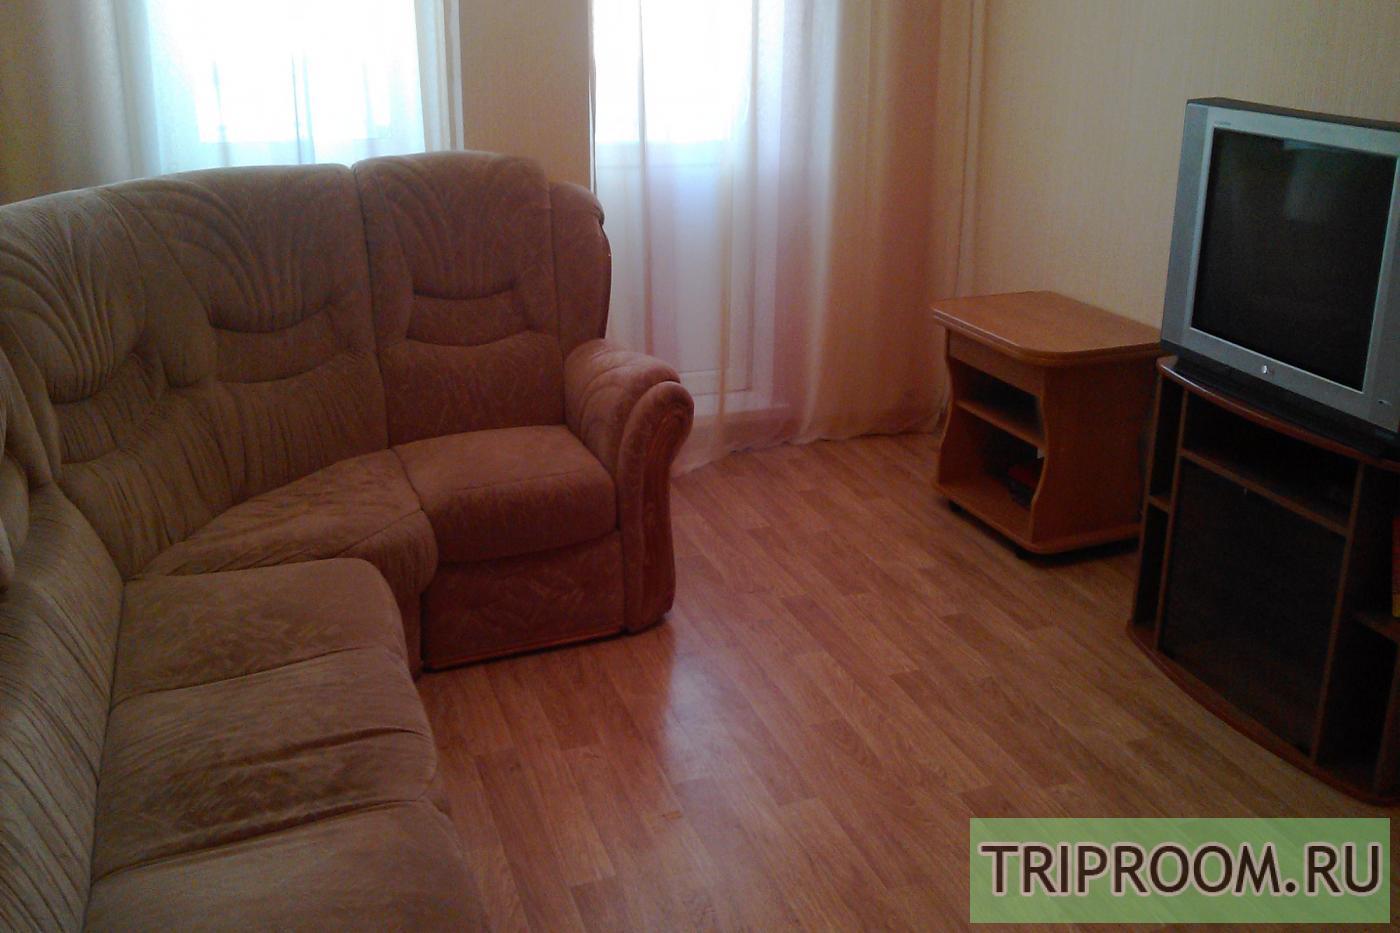 2-комнатная квартира посуточно (вариант № 5897), ул. Алексеева улица, фото № 5